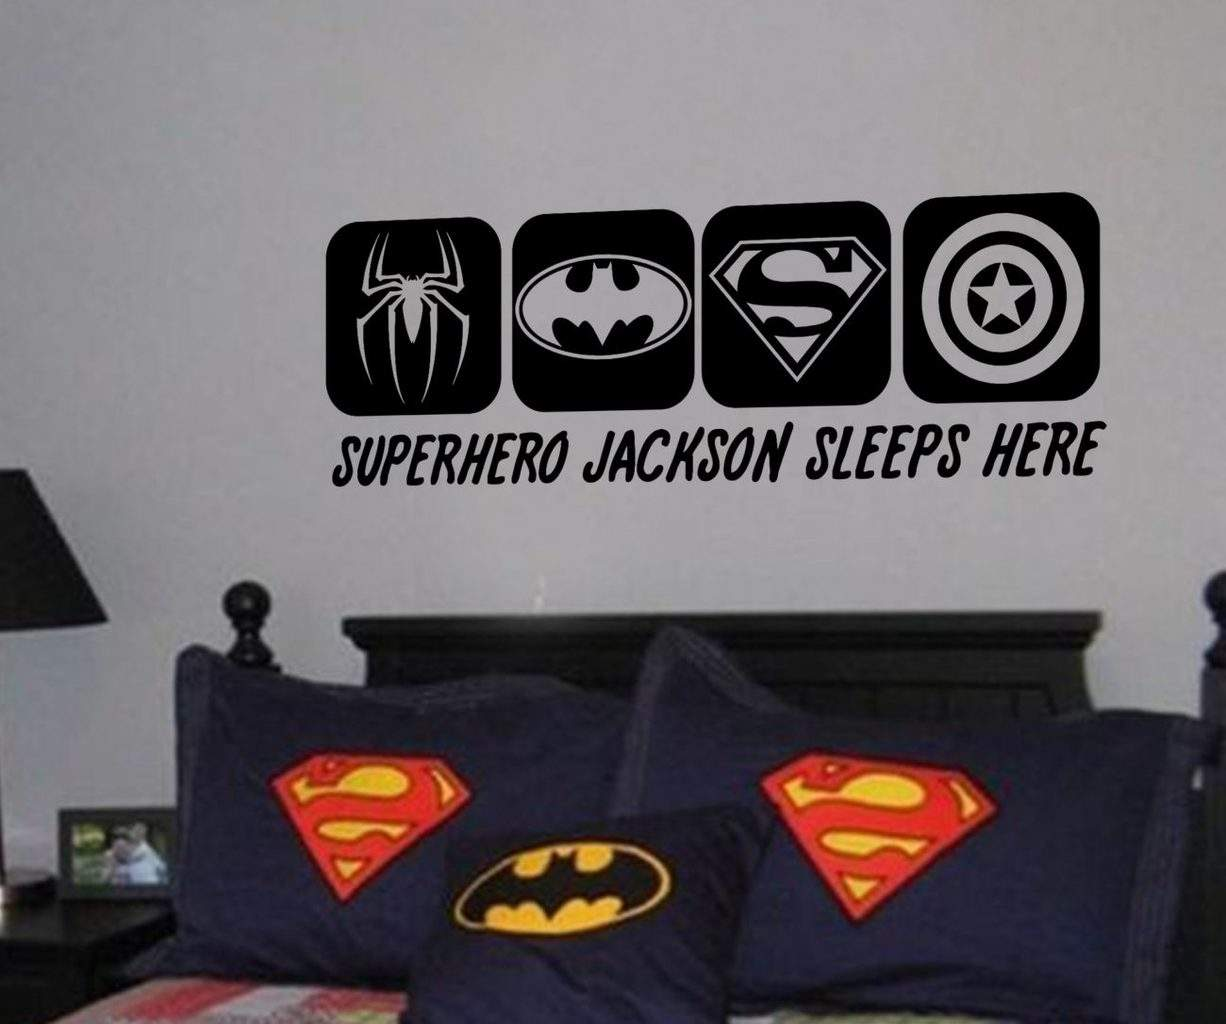 Superhero sleeps here wall art decal sticker